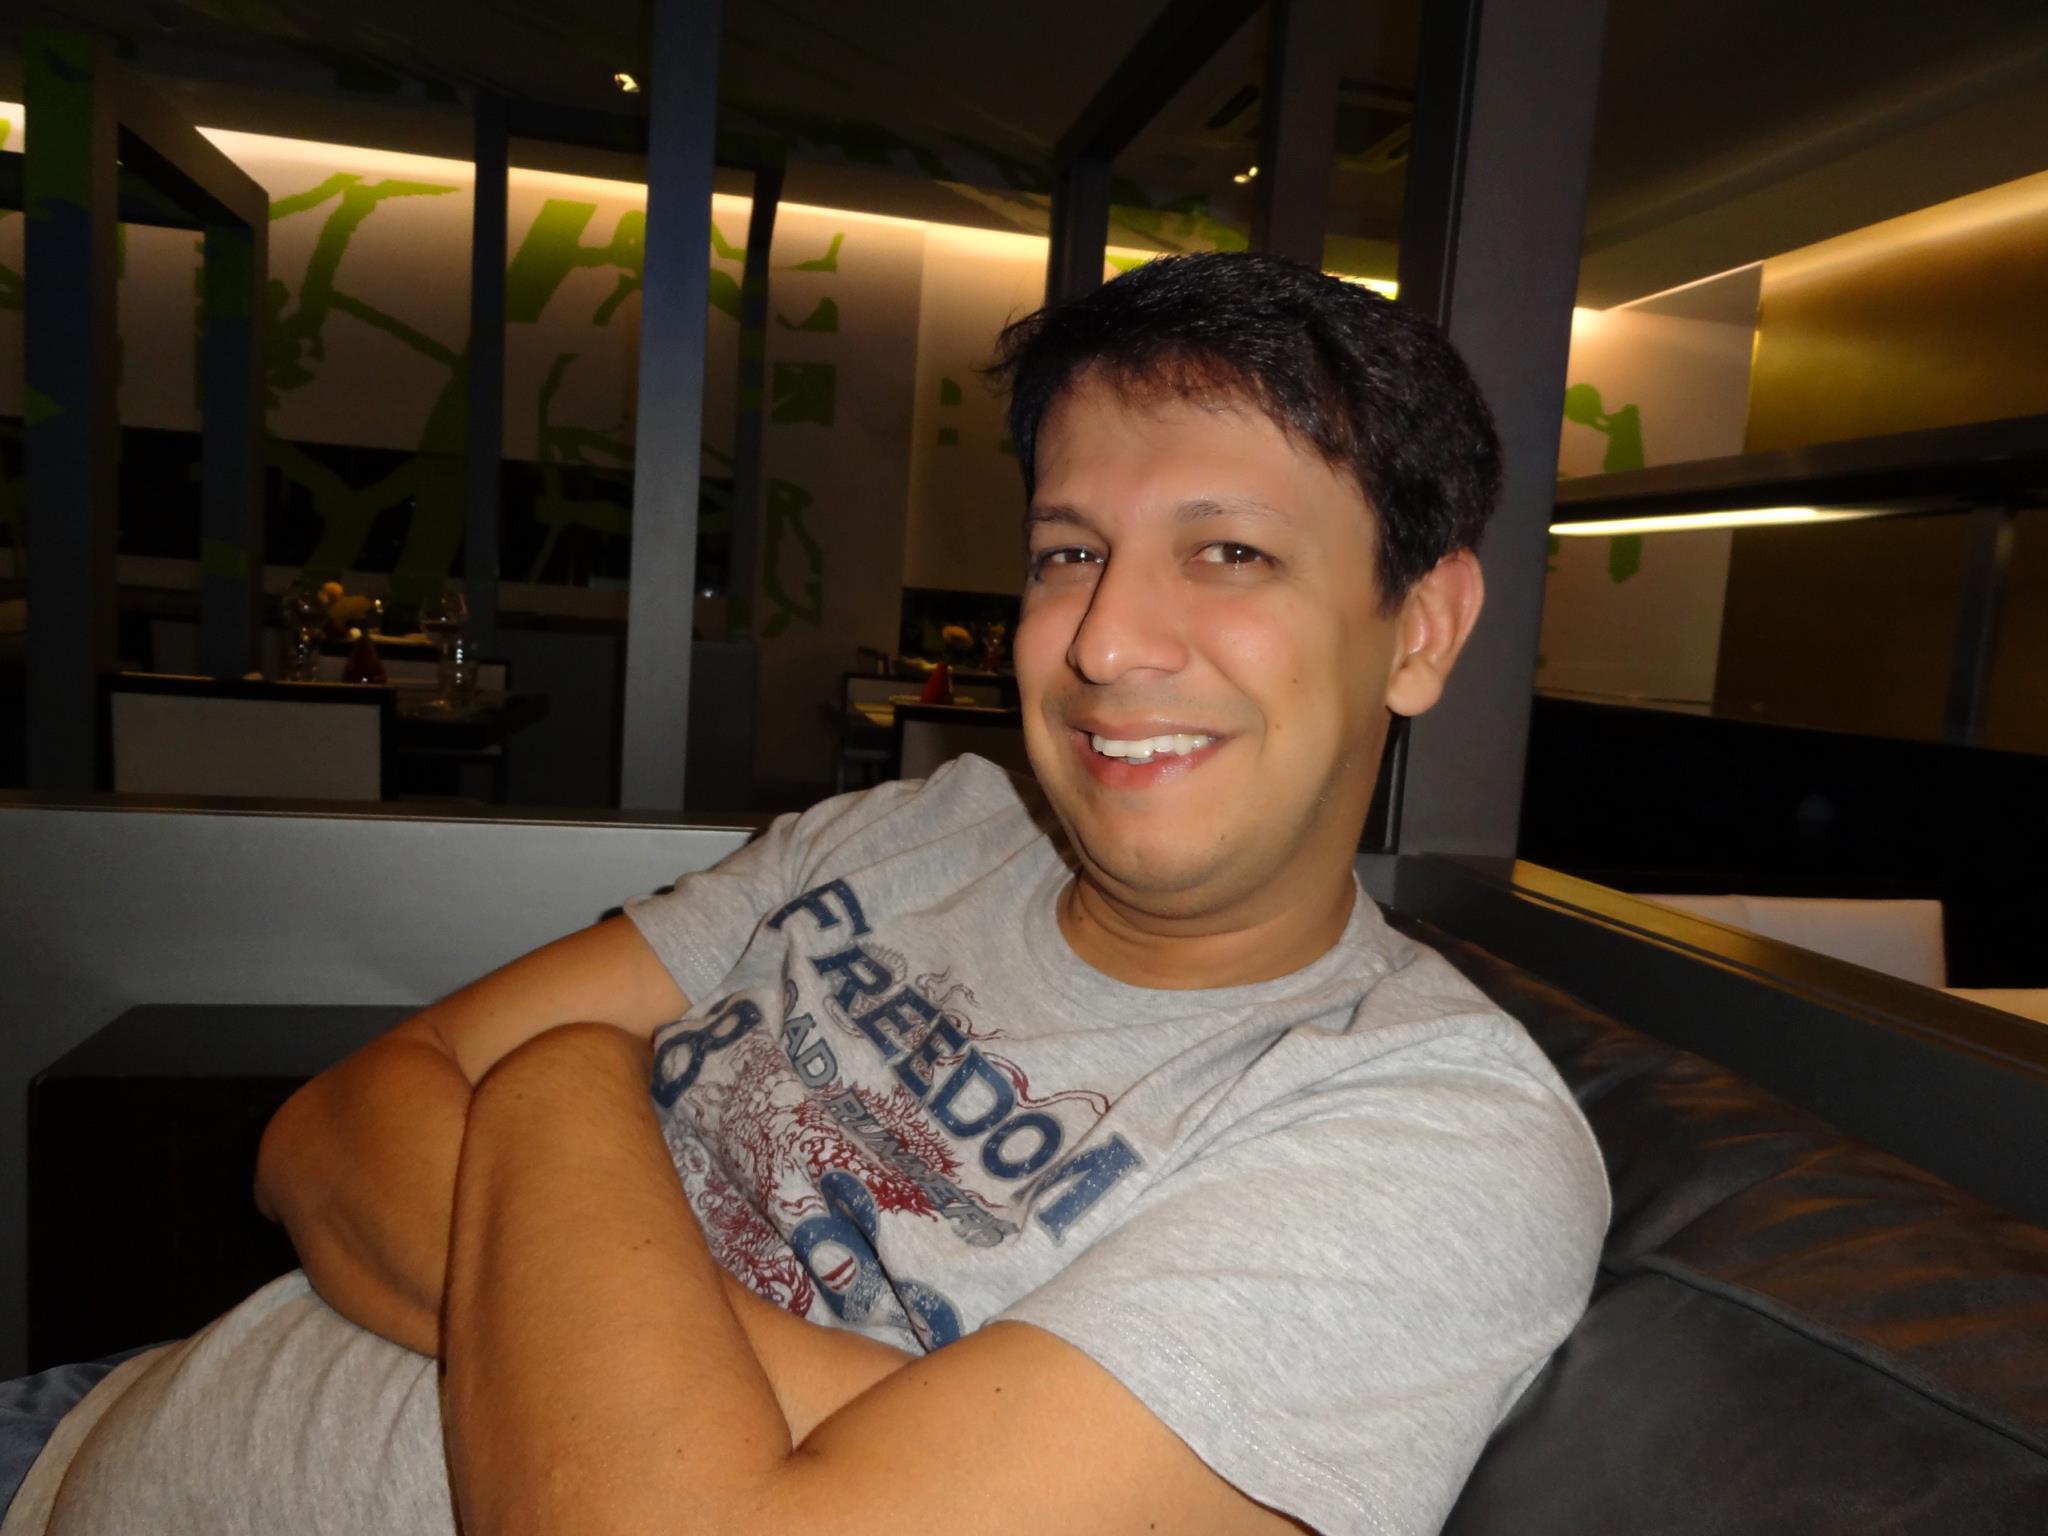 Avatar - Alexandre C. Pereira